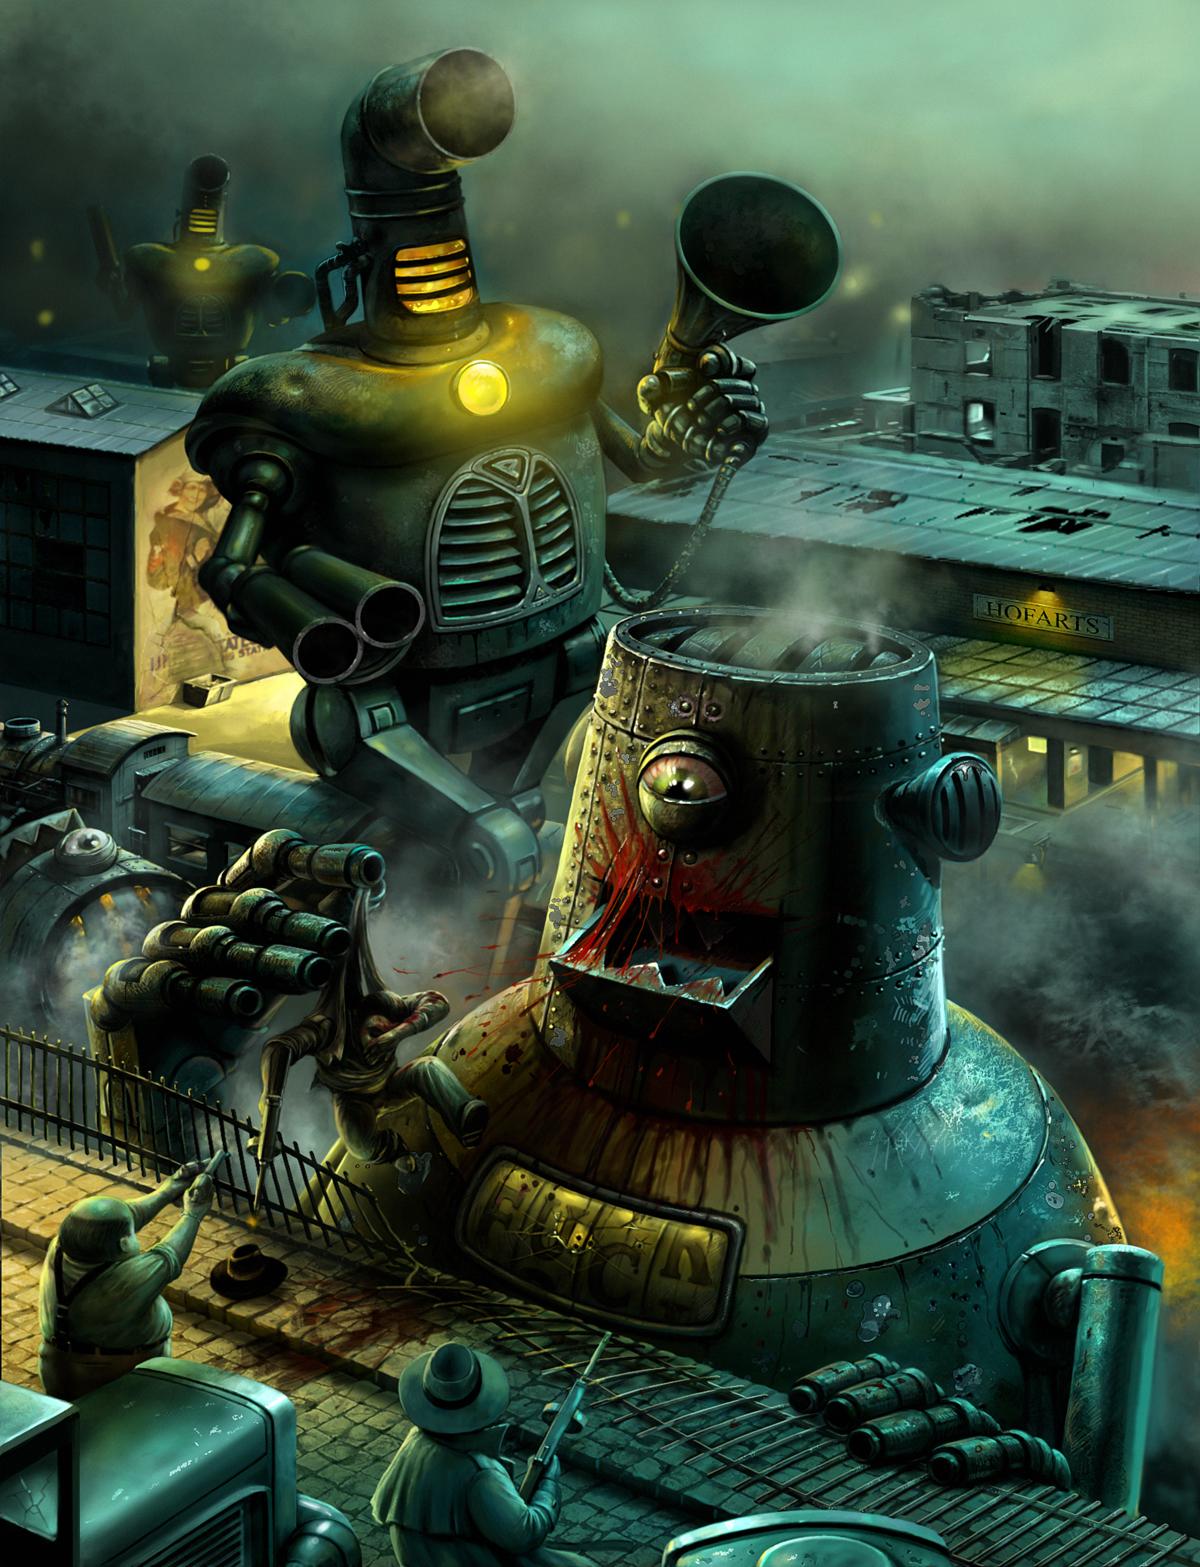 RetroRobots